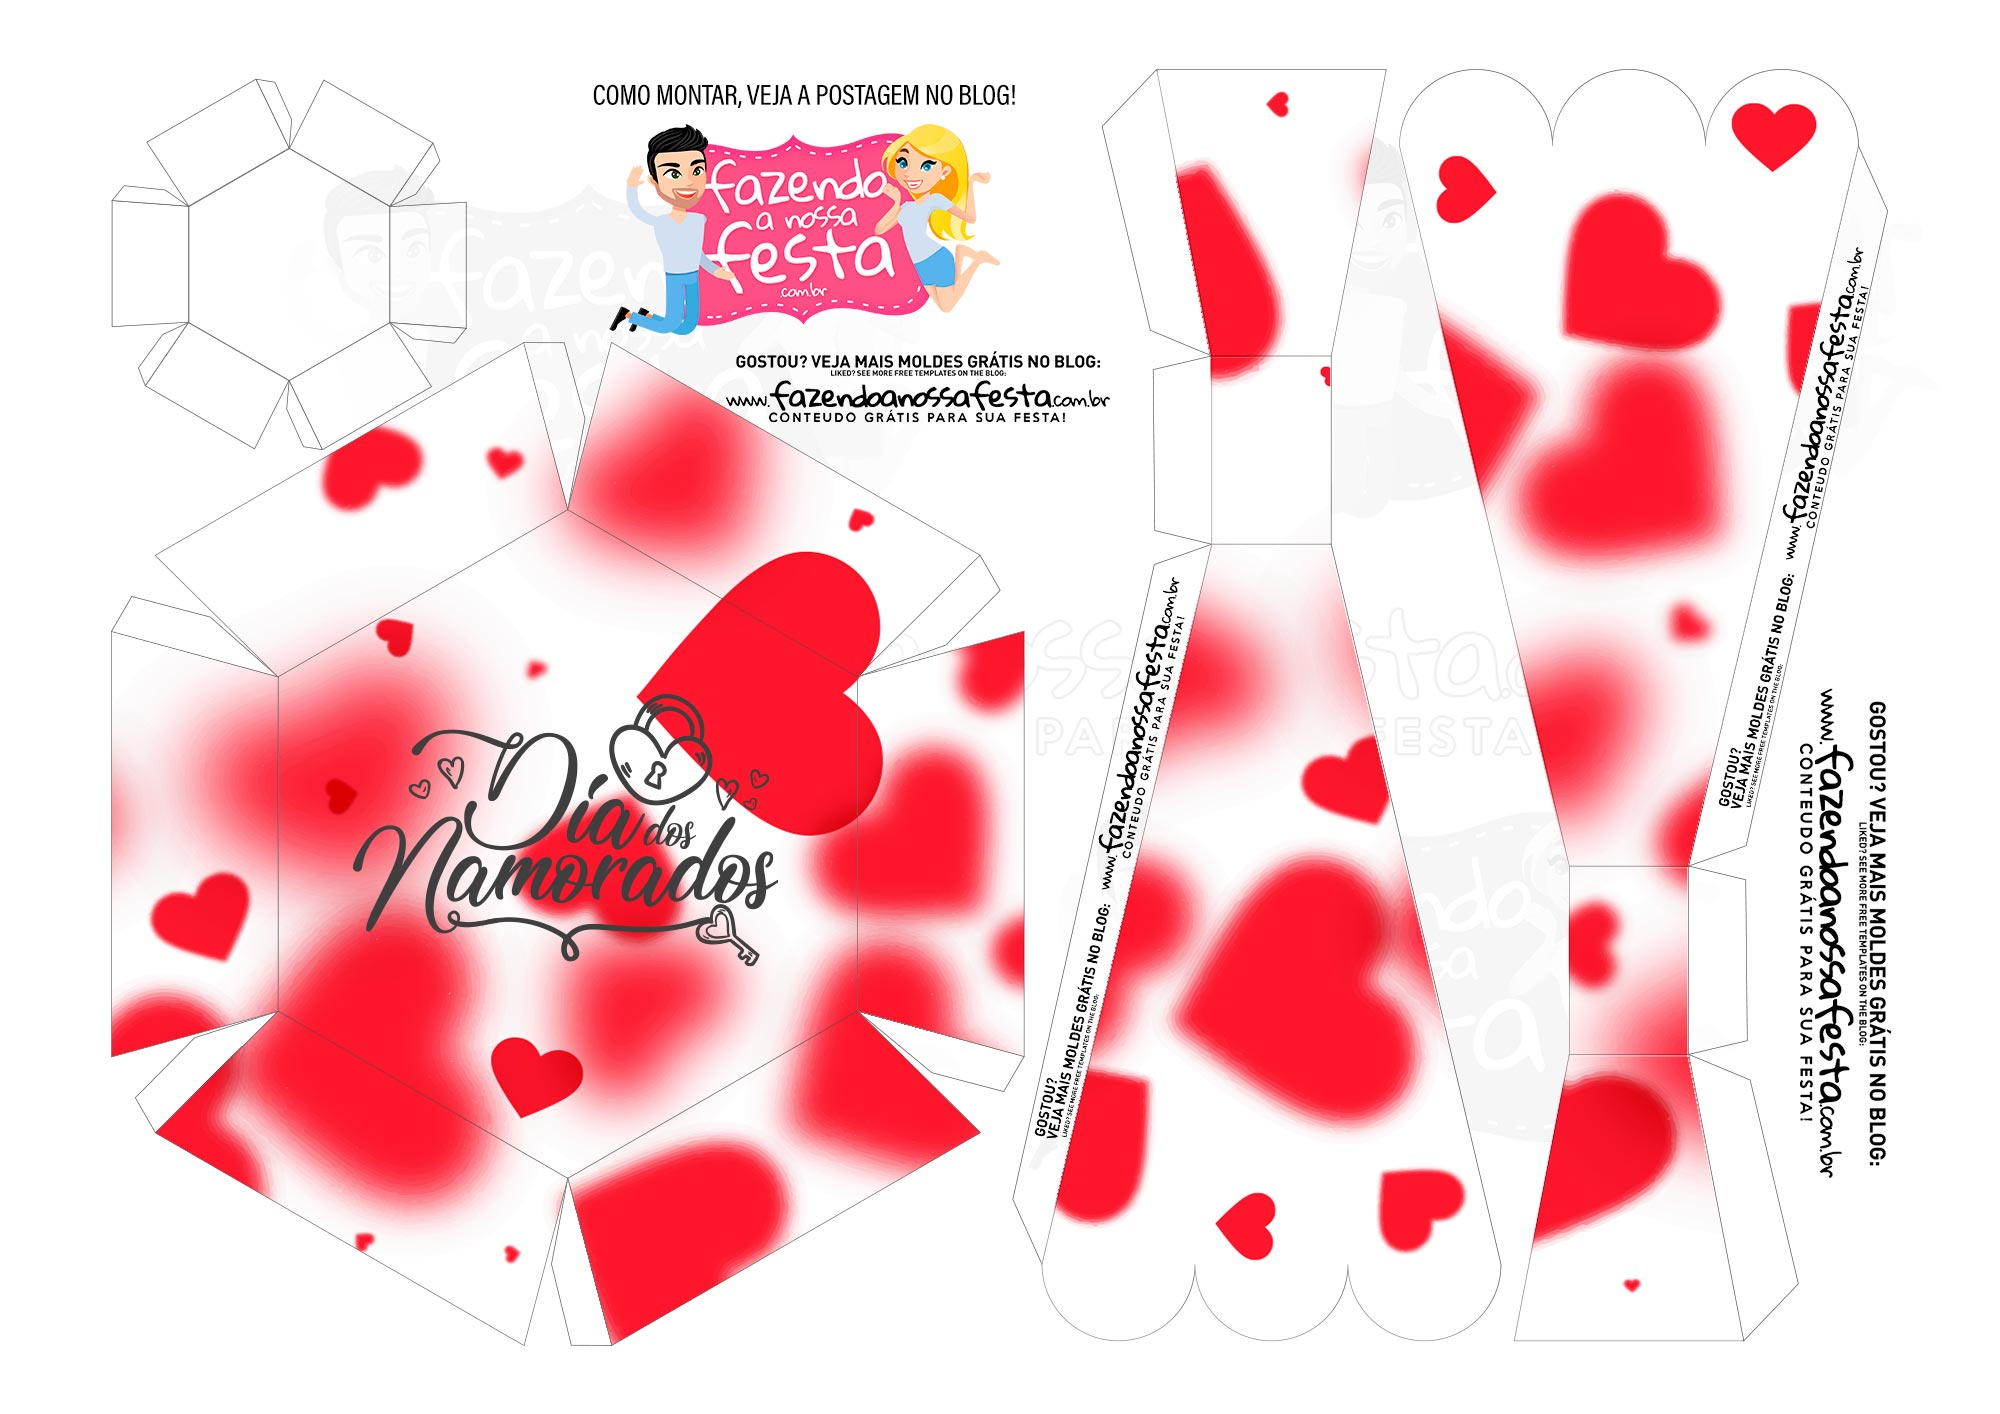 Caixa Buque Feliz Dia dos Namorados 2